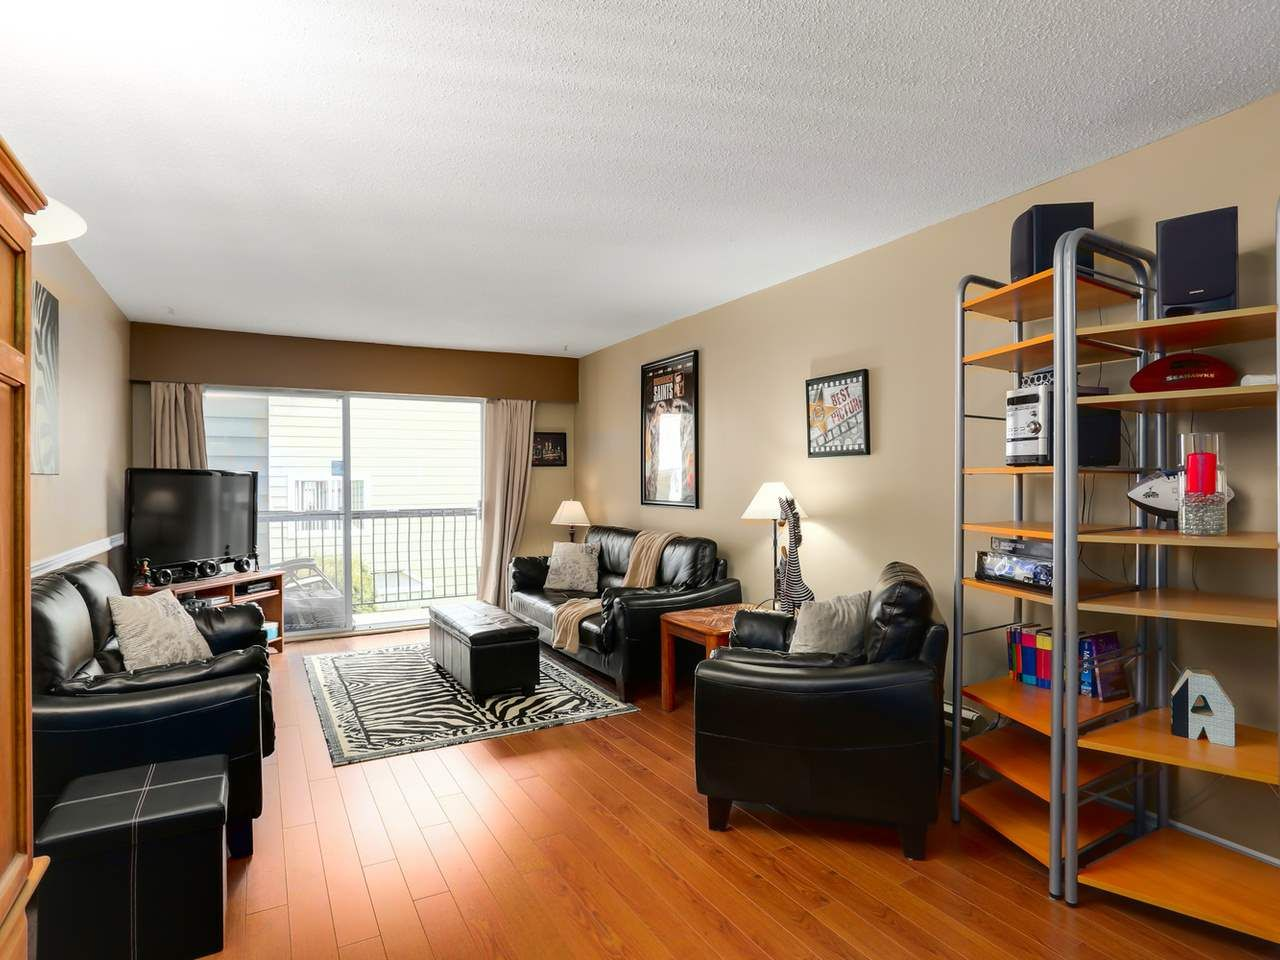 "Photo 6: Photos: 278C 8635 120 Street in Delta: Annieville Condo for sale in ""Delta Cedars"" (N. Delta)  : MLS®# R2037207"